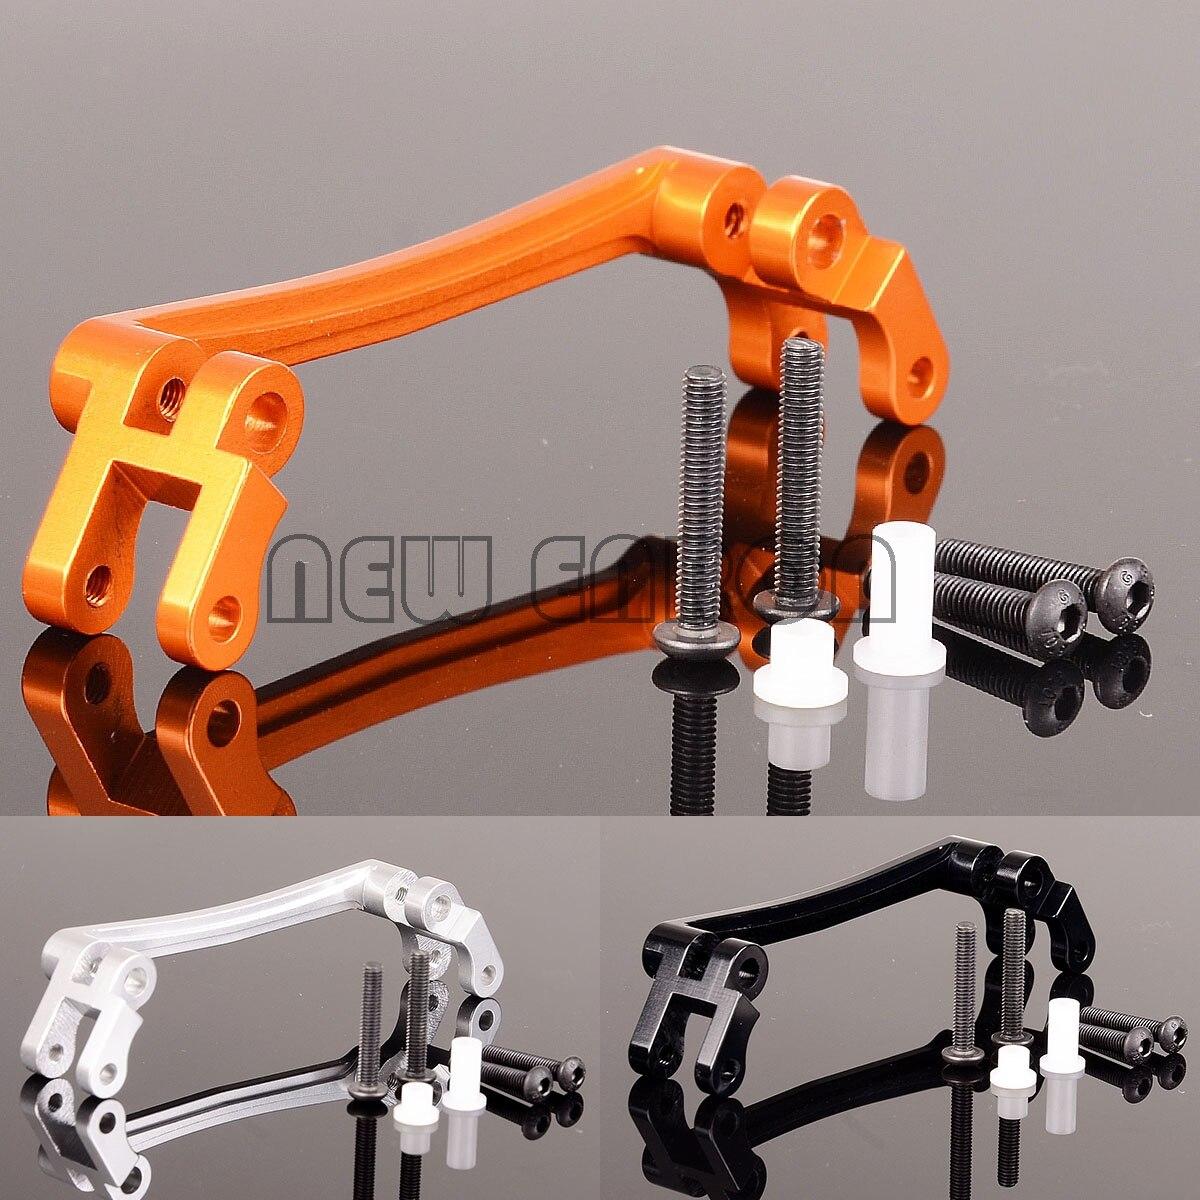 NEW ENRON Aluminum Bell Crank Steering Assembly Arm Rod YTL049 RC CAR 1/8 RC 1:8  FOR AXIAL 1/8 YETI XL 90026 AX31122